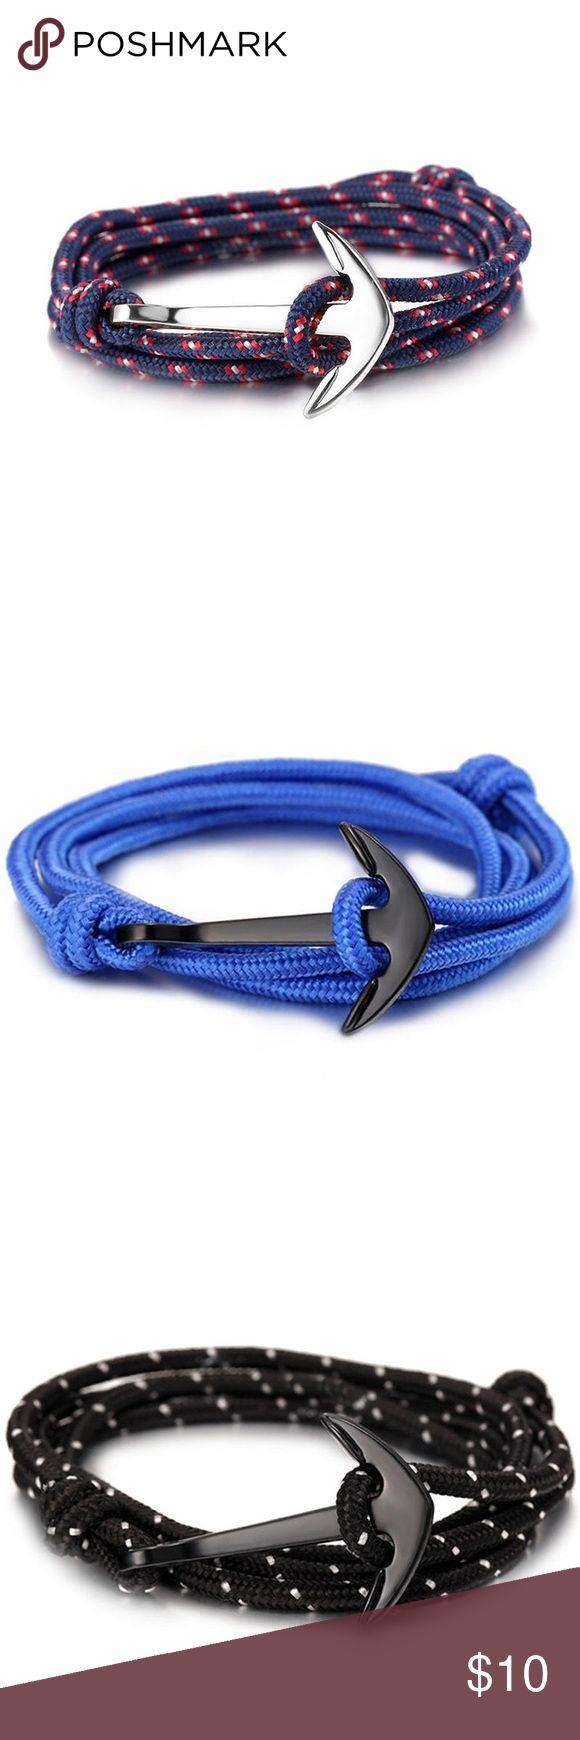 Anchor Bracelet Anchor Bracelet for Men and Women Jewelry Bracelets